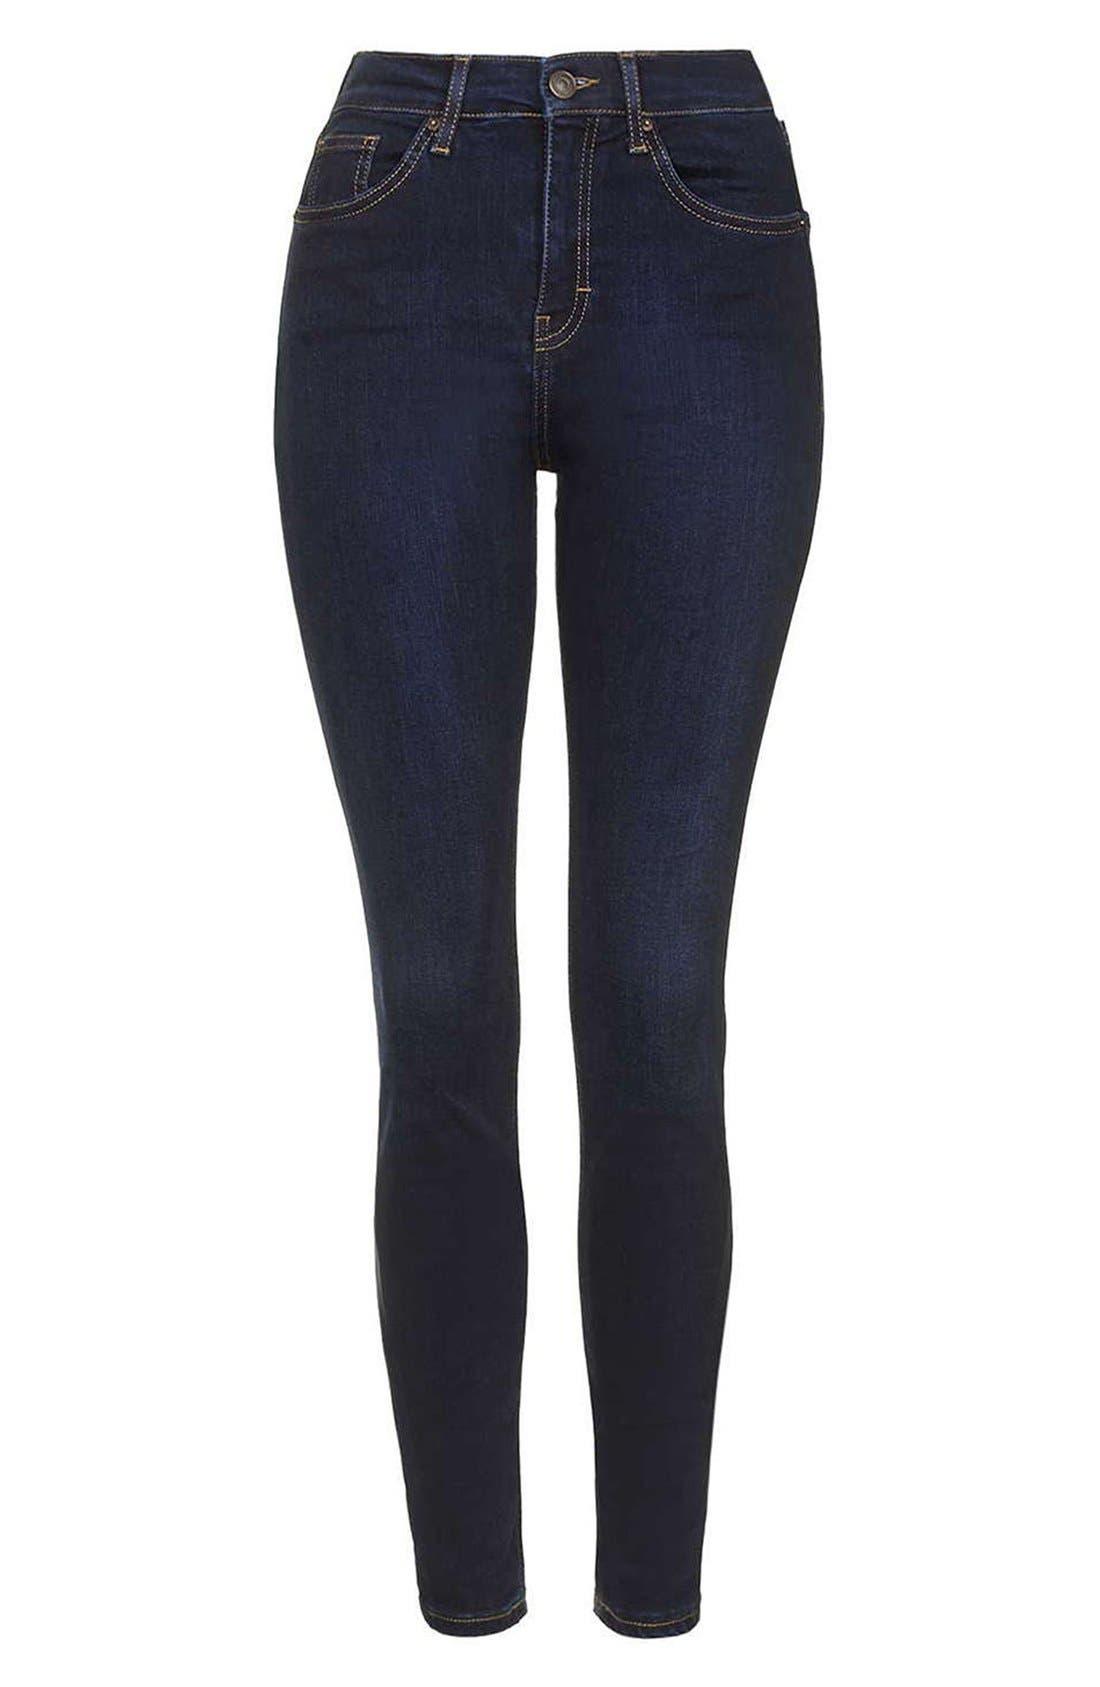 Alternate Image 4  - Topshop Moto 'Jamie' High Rise Skinny Jeans  (Tall)